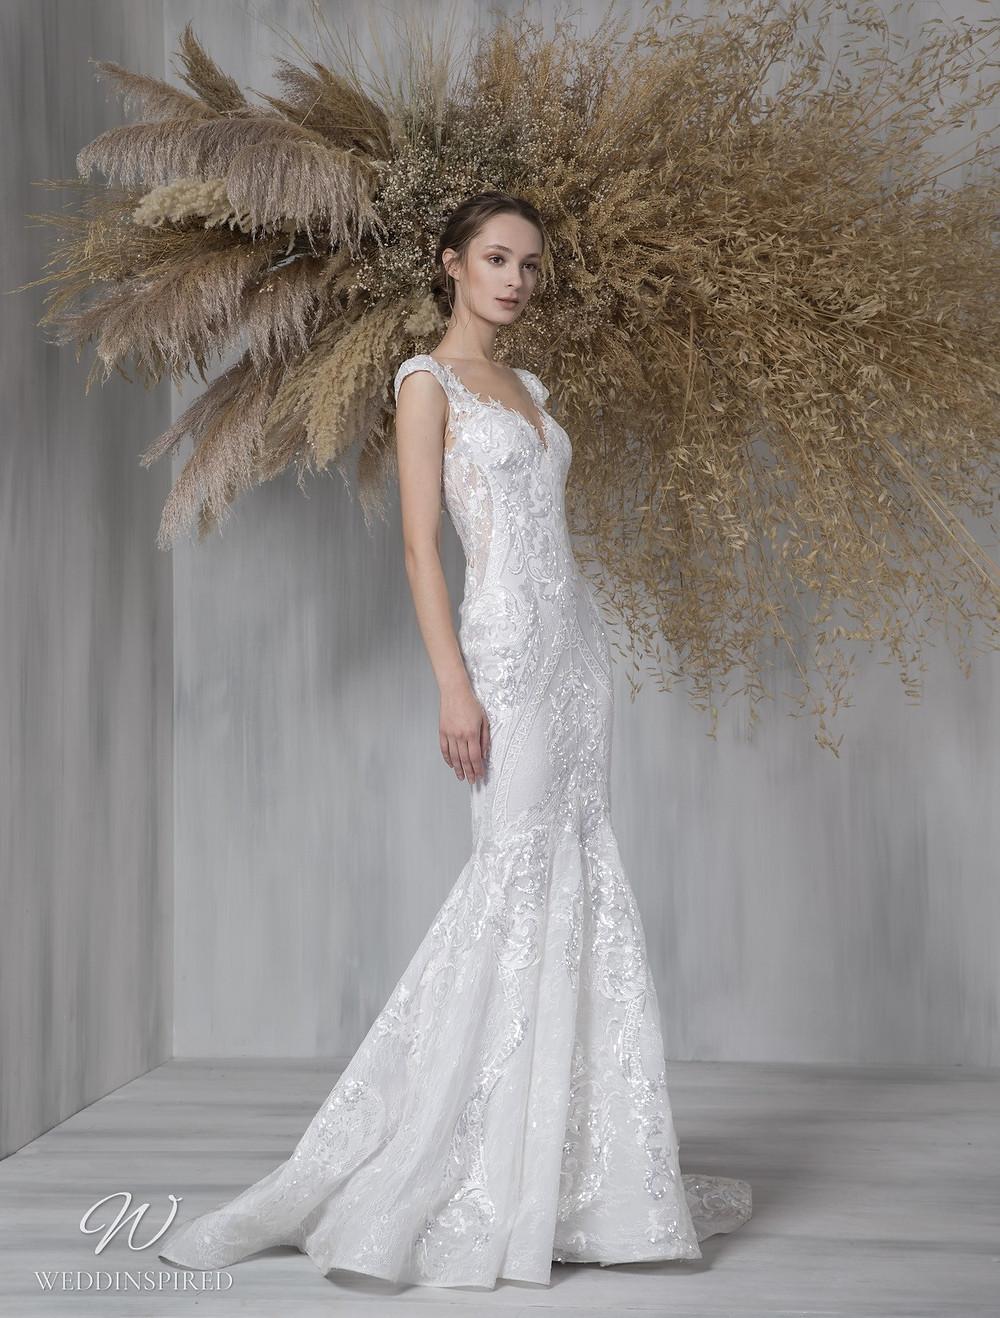 A Tony Ward 2021 lace mermaid wedding dress with cap sleeves